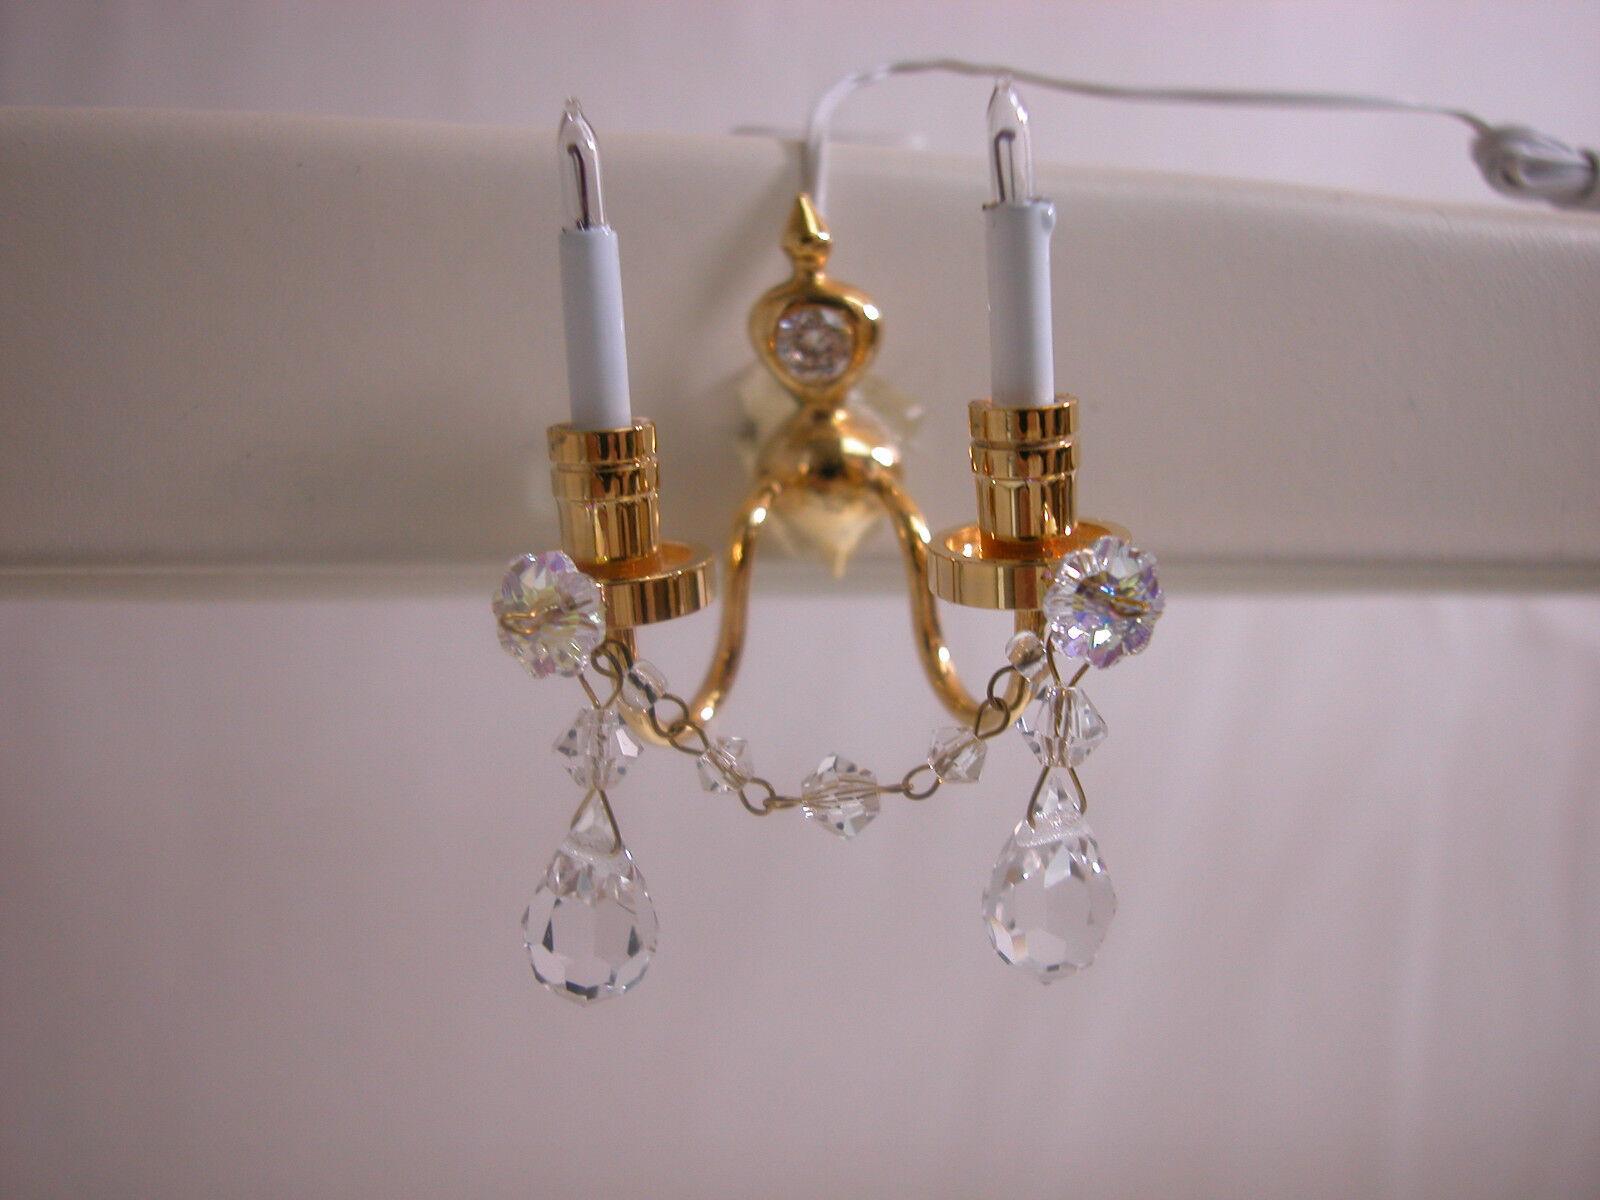 Heidi Ott Dollhouse Miniature Light 1:12 Scale Crystal  Wall Lamp  YL7003 XMAS